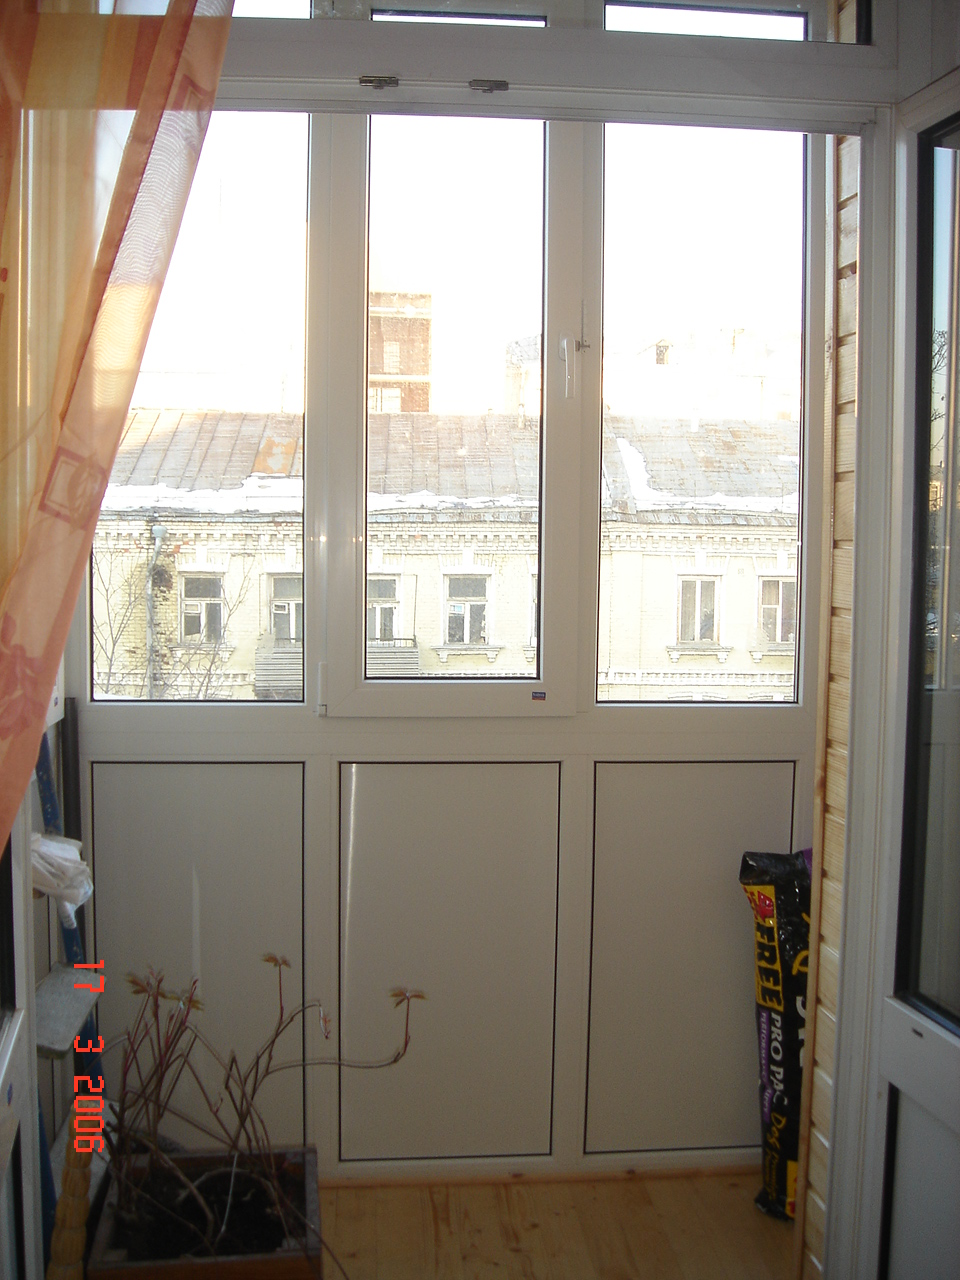 Галерея - столица окна.